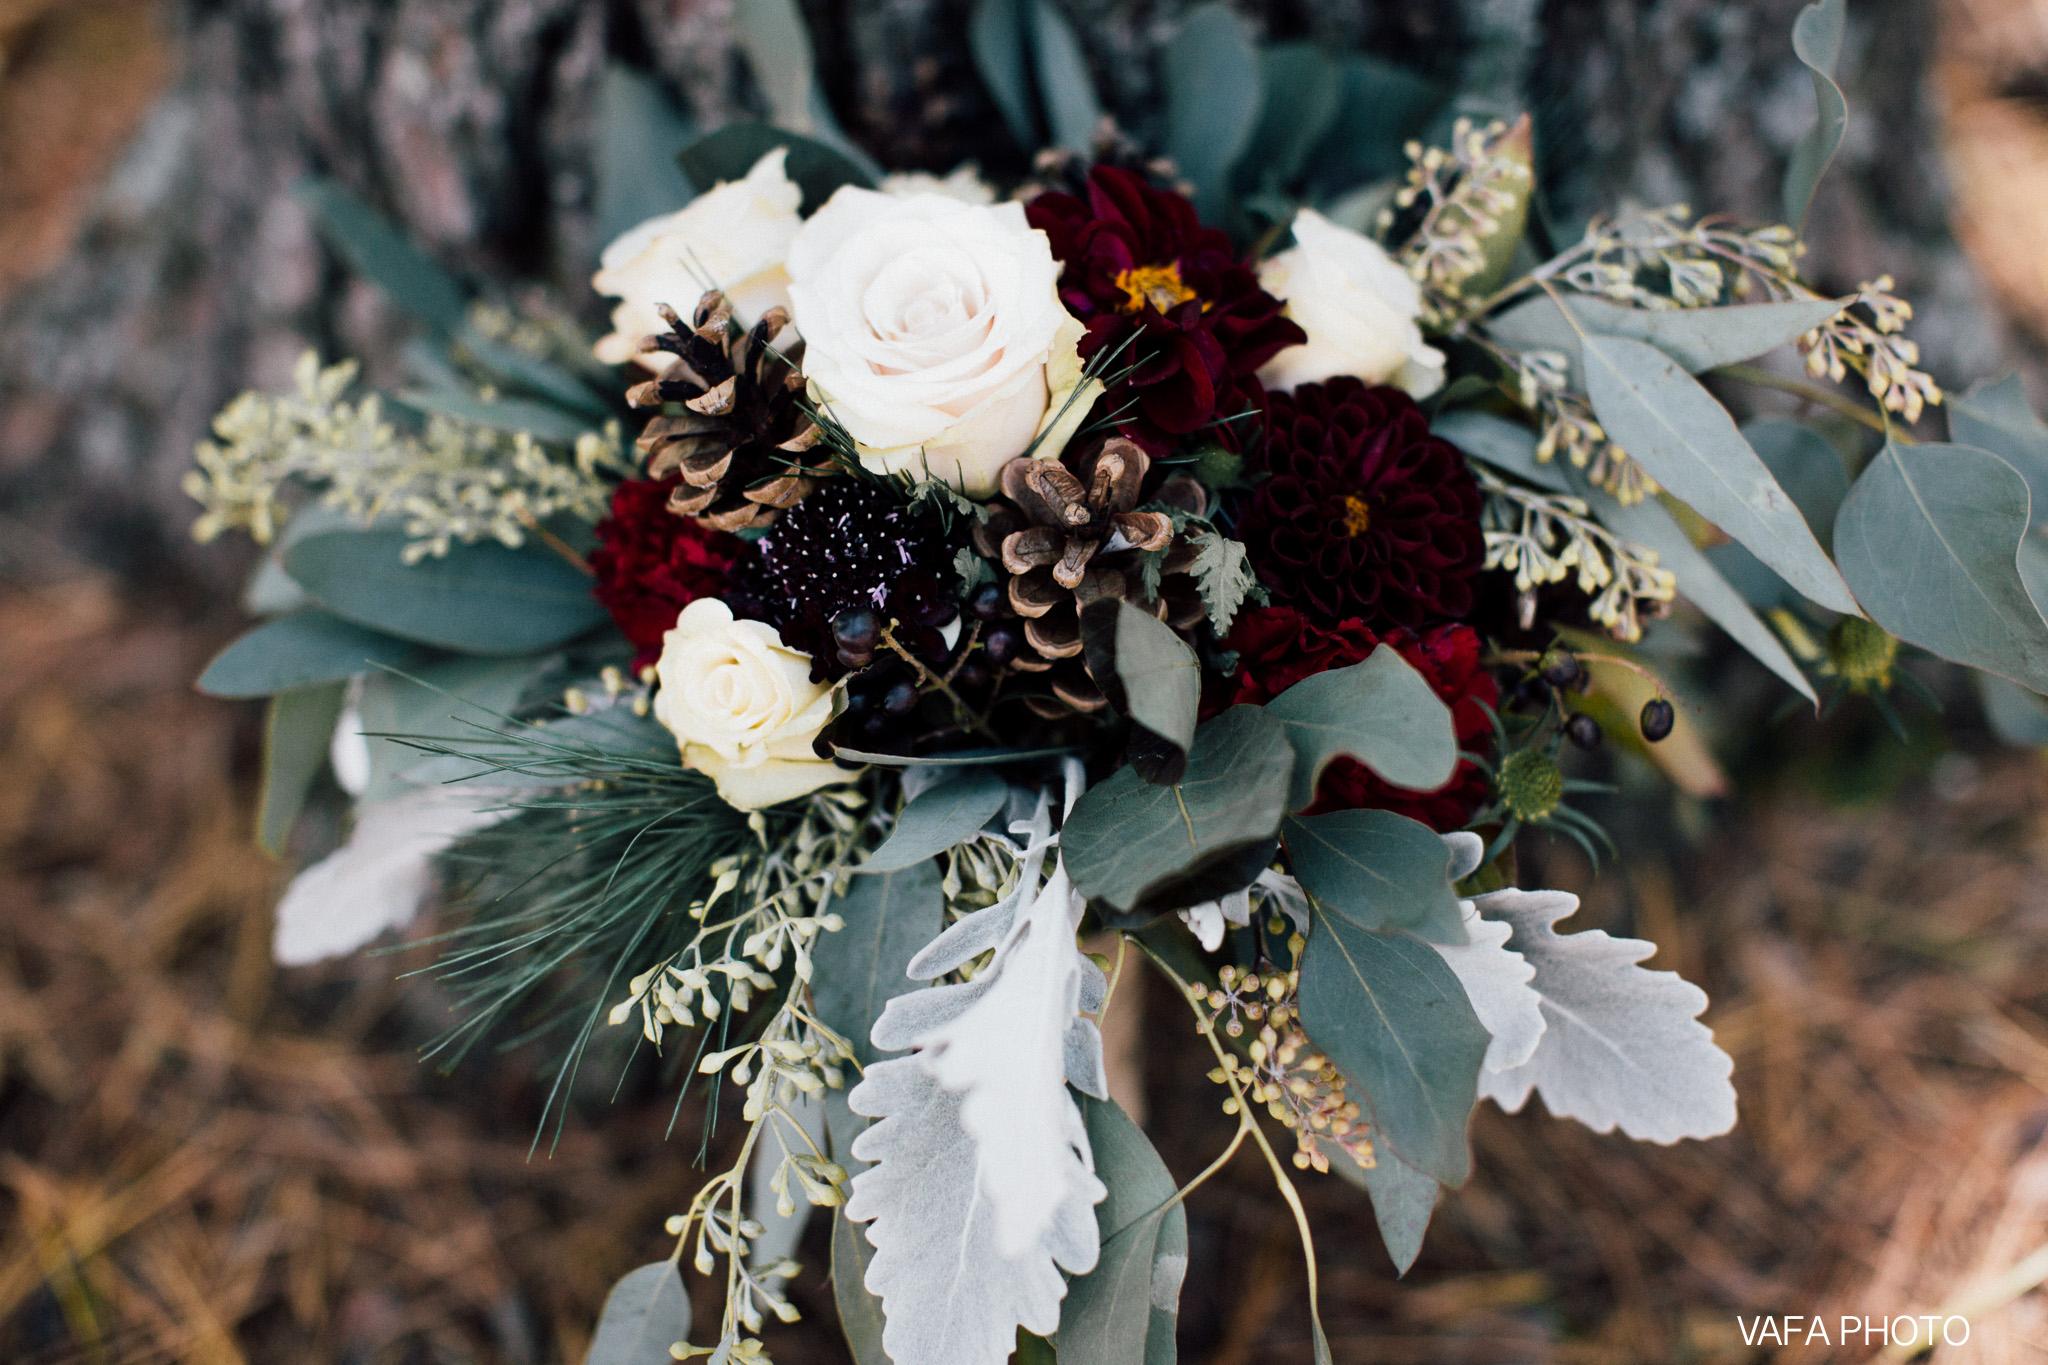 Hogback-Mountain-Wedding-Chelsea-Josh-Vafa-Photo-672.jpg